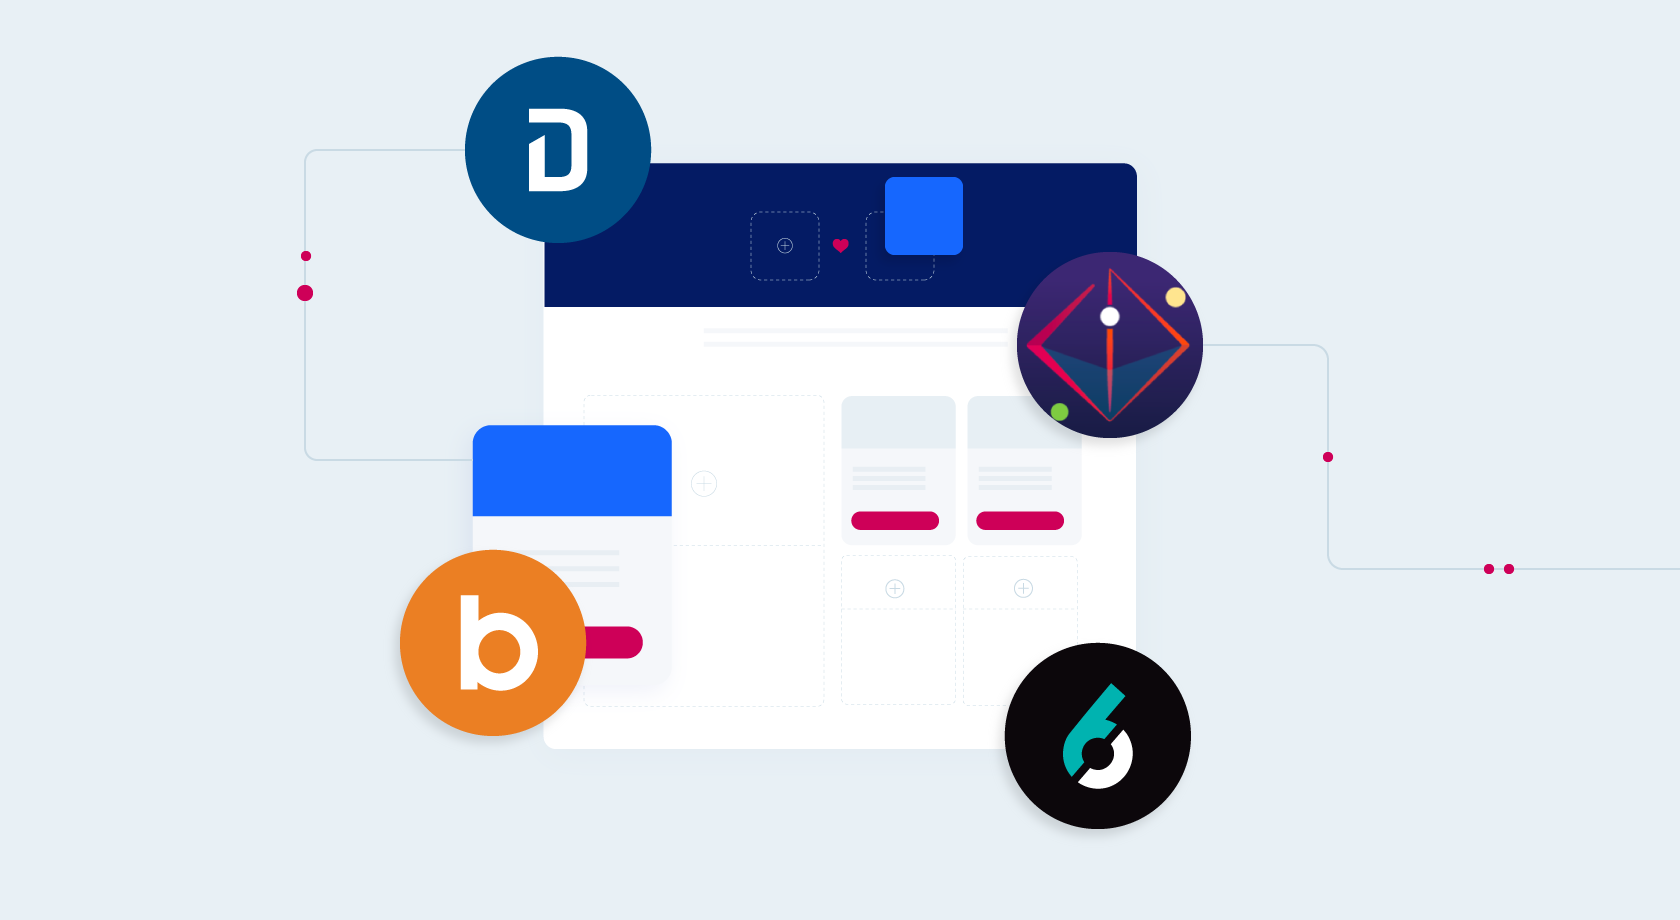 bombora, 6sense, query string, and demandbase apps surrounding an uberflip ABM destination